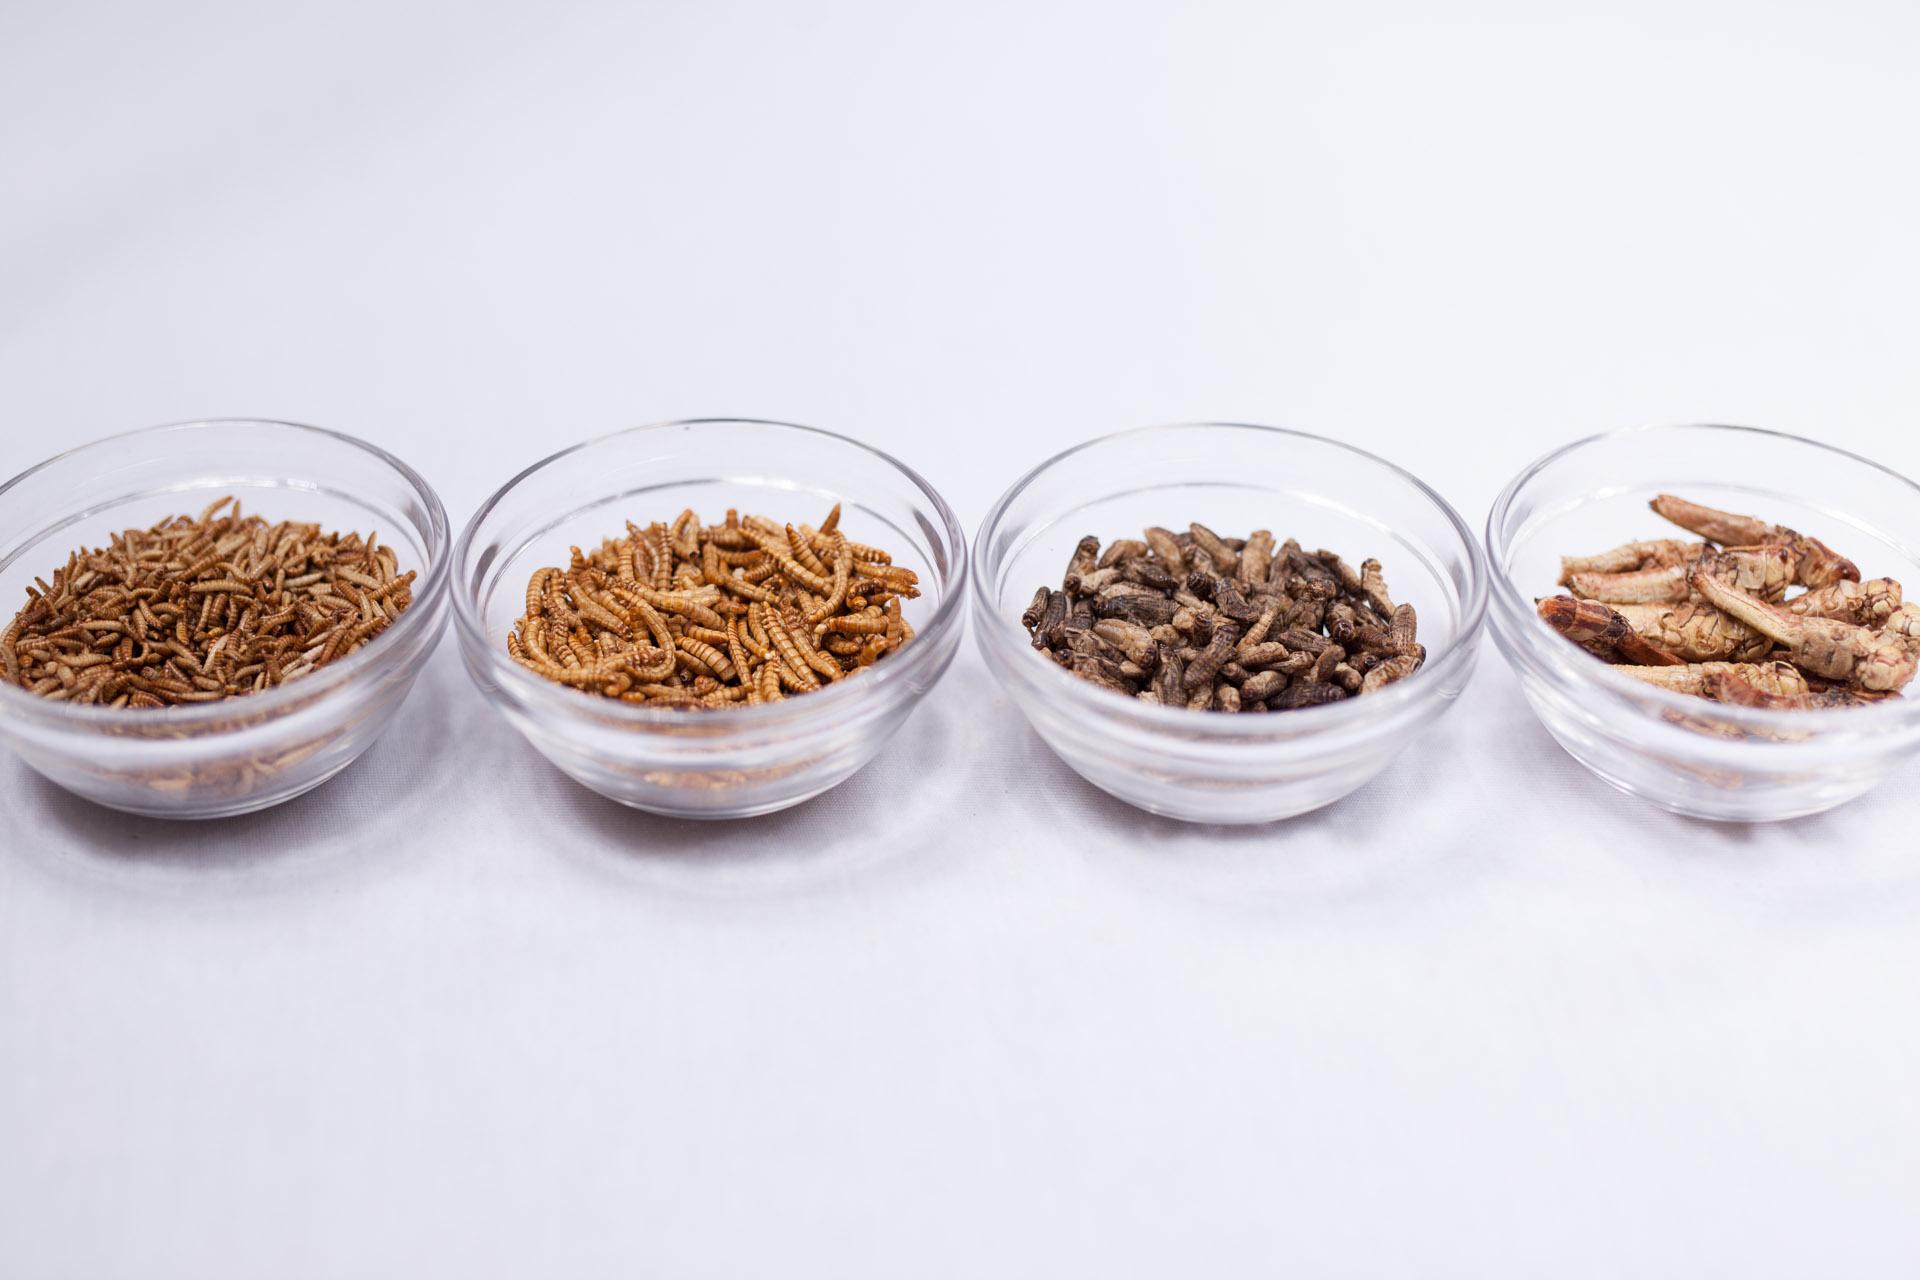 Buffalowürmer, Mehlwürmer, Heimchen (Grillen) und Wanderheuschrecken